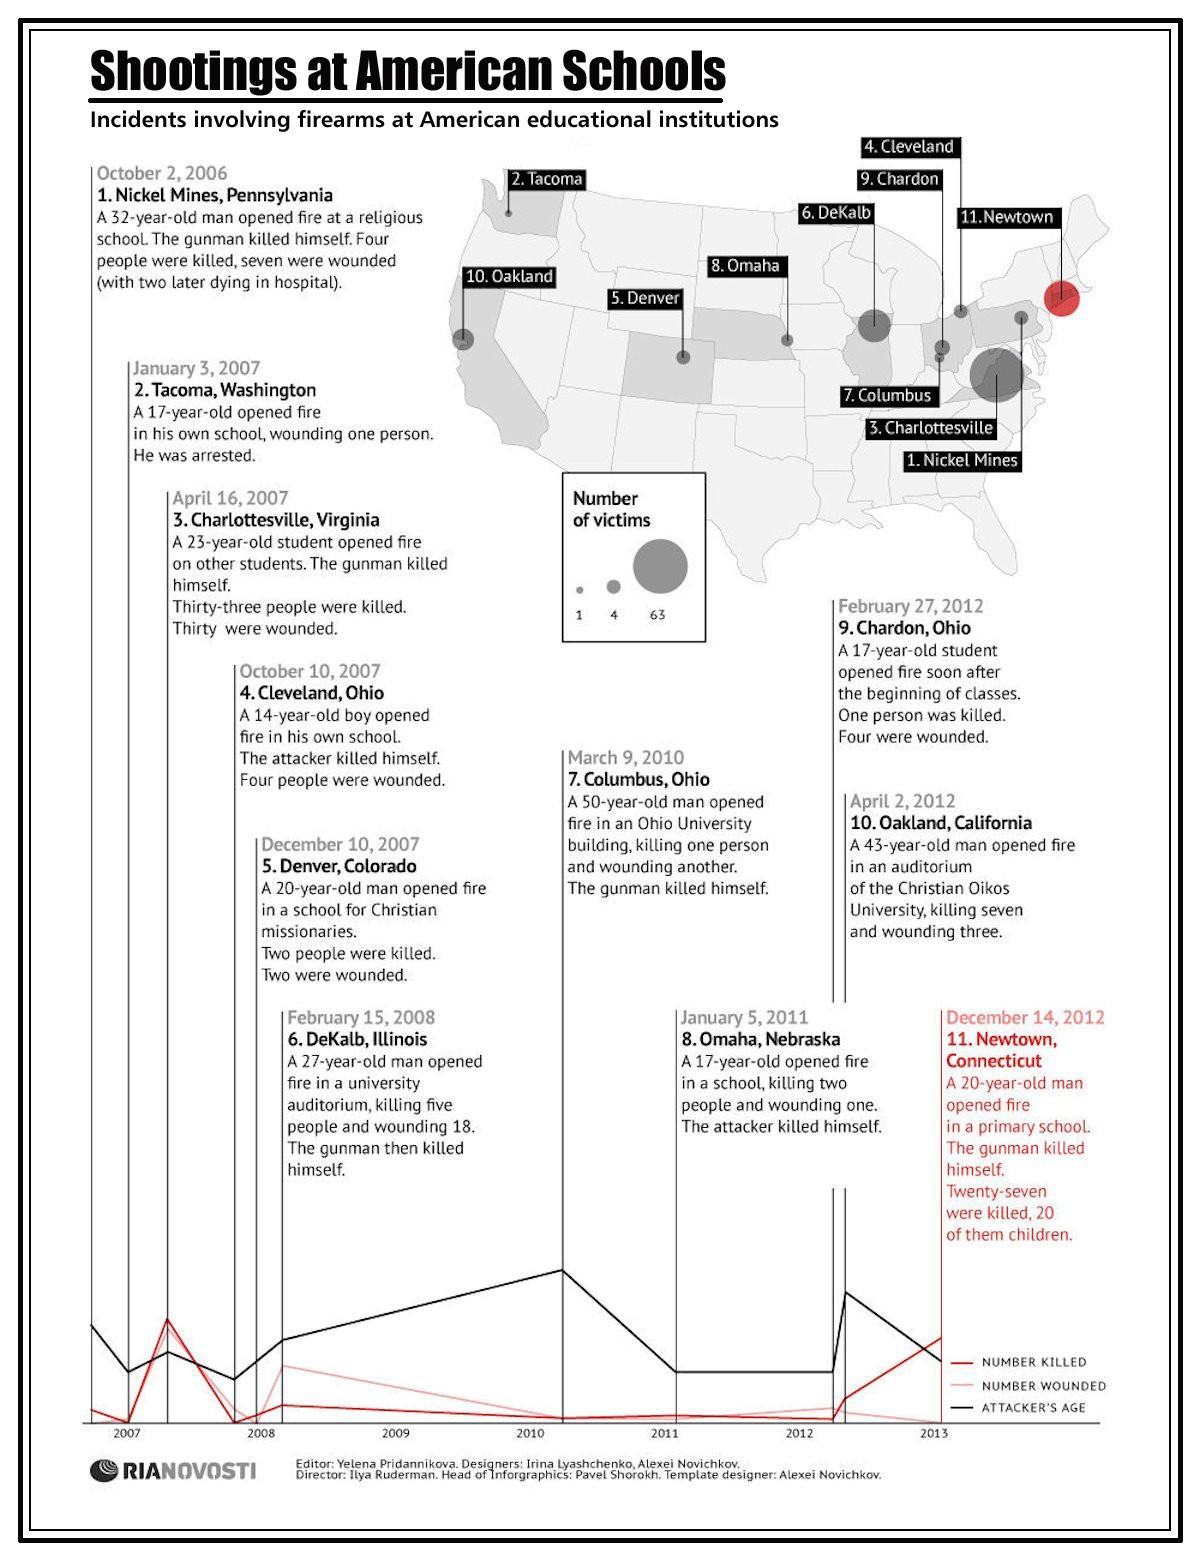 00 RIA-Novosti Infographics. Shootings at American Schools. 2012